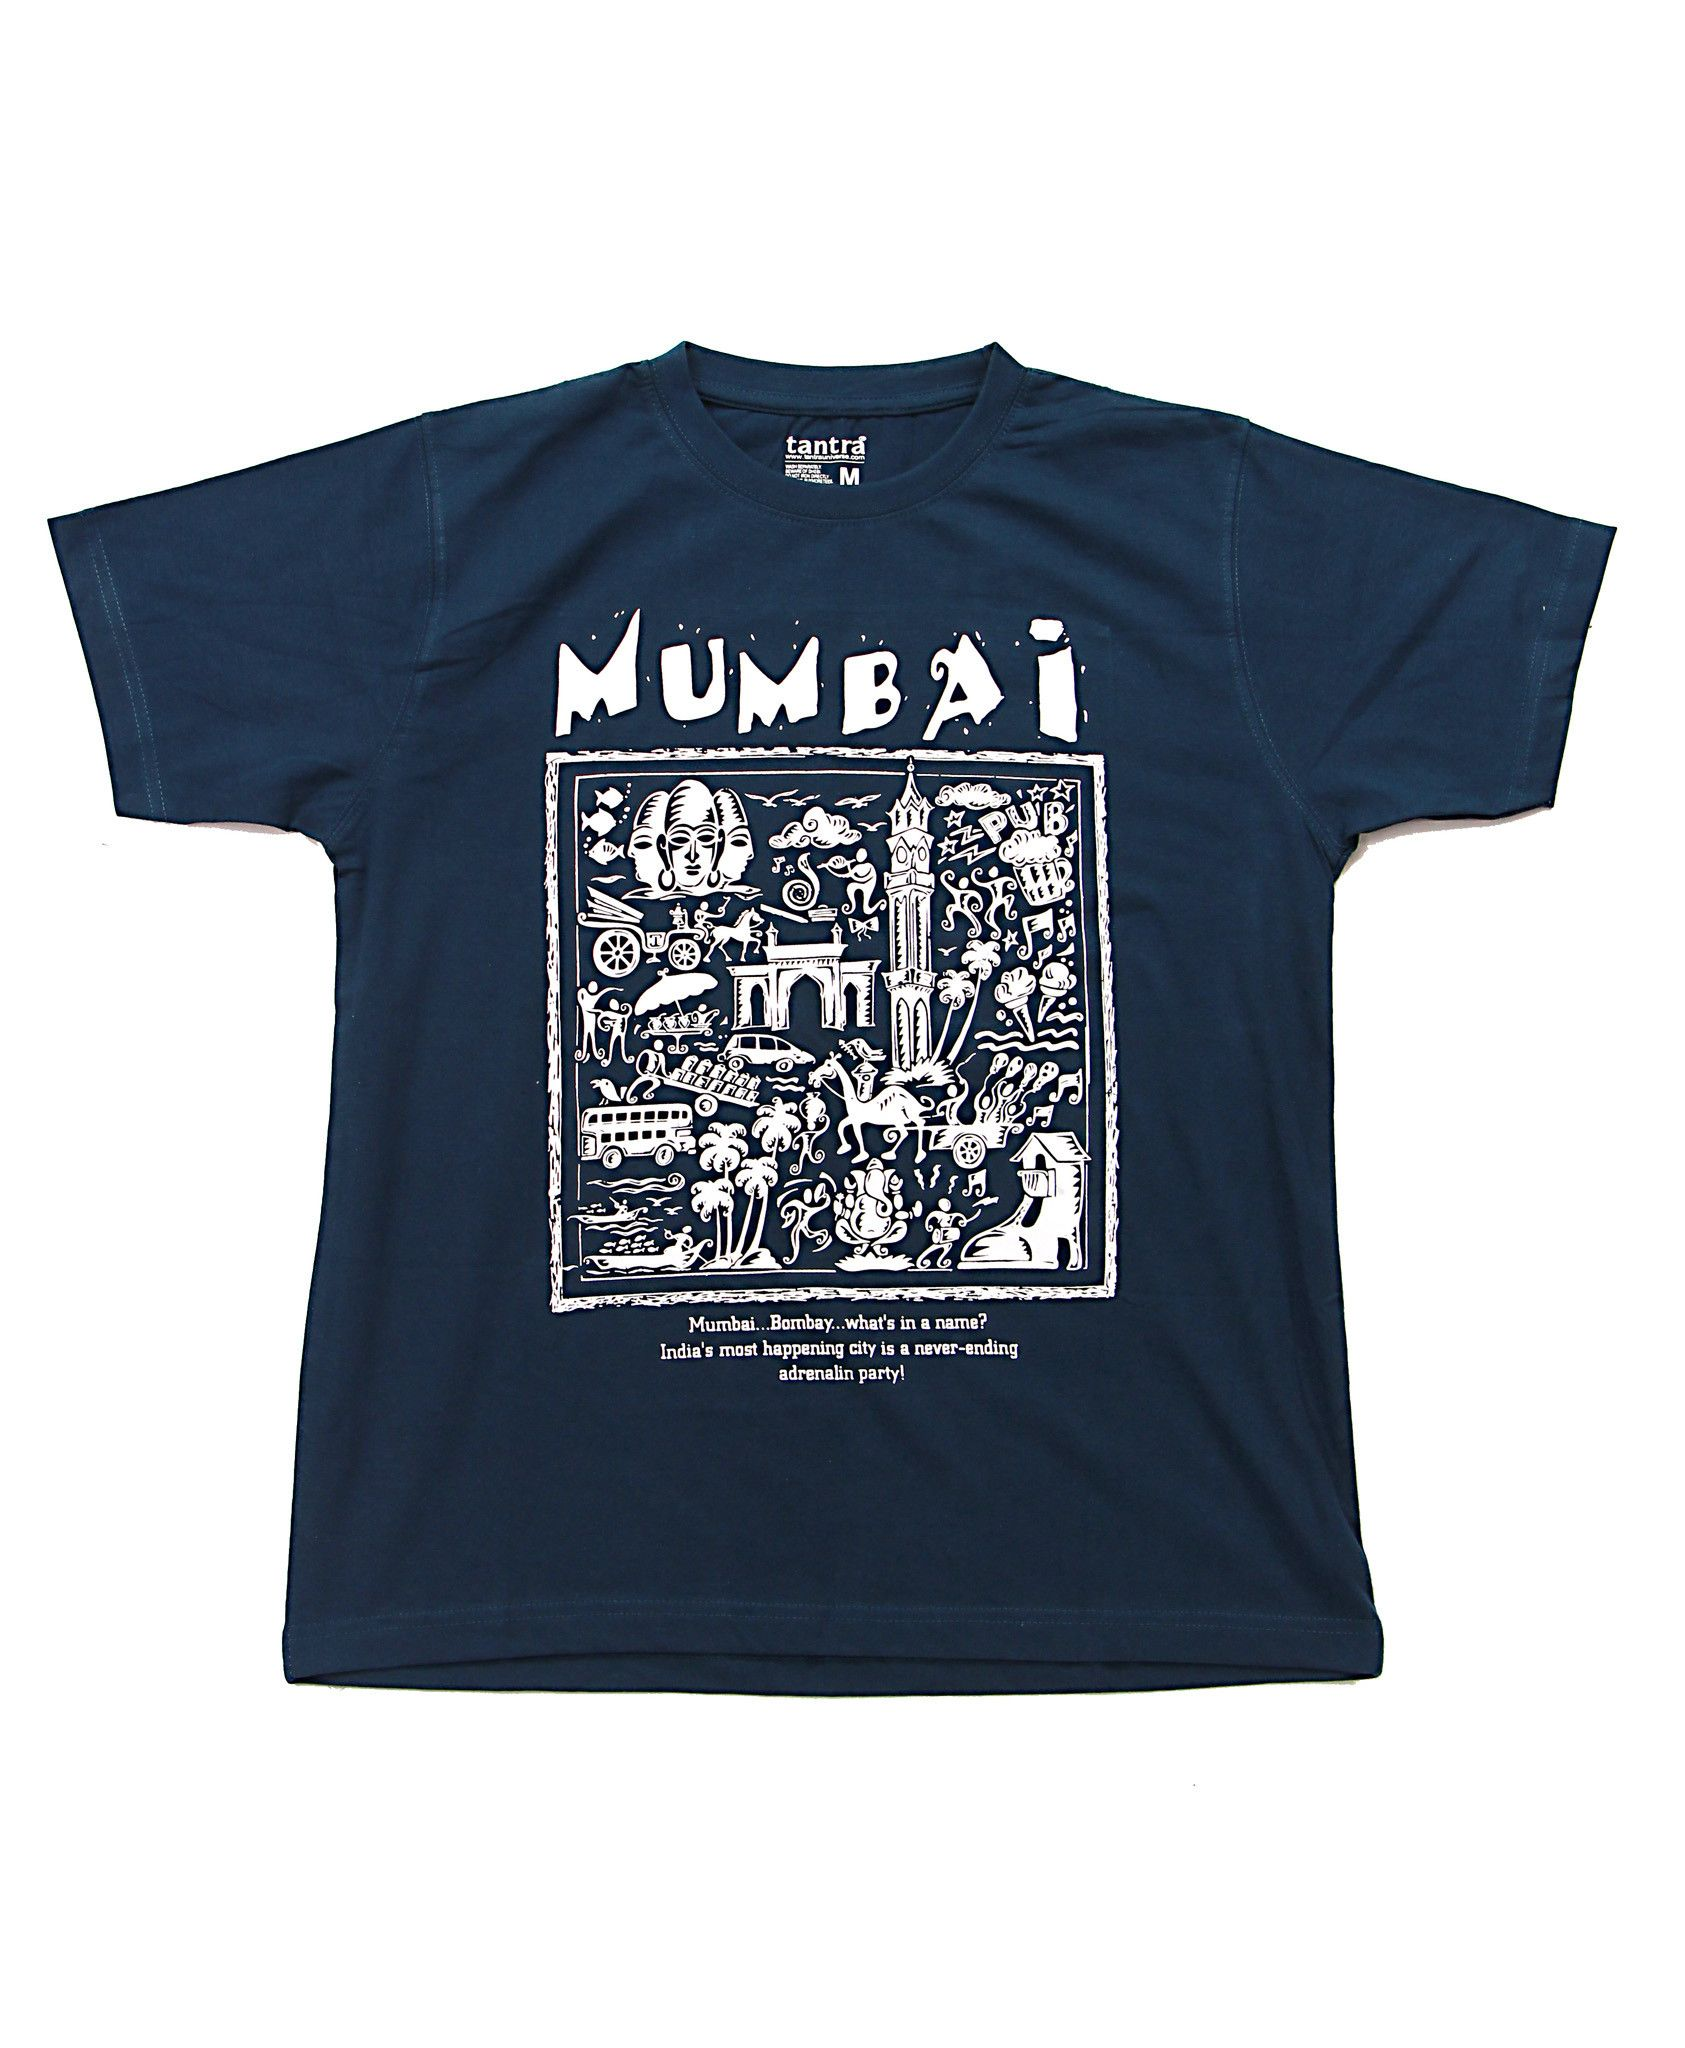 Bombay/Mumbai, Men, Cool TShirt Designs Online Graphic T Shirts ...